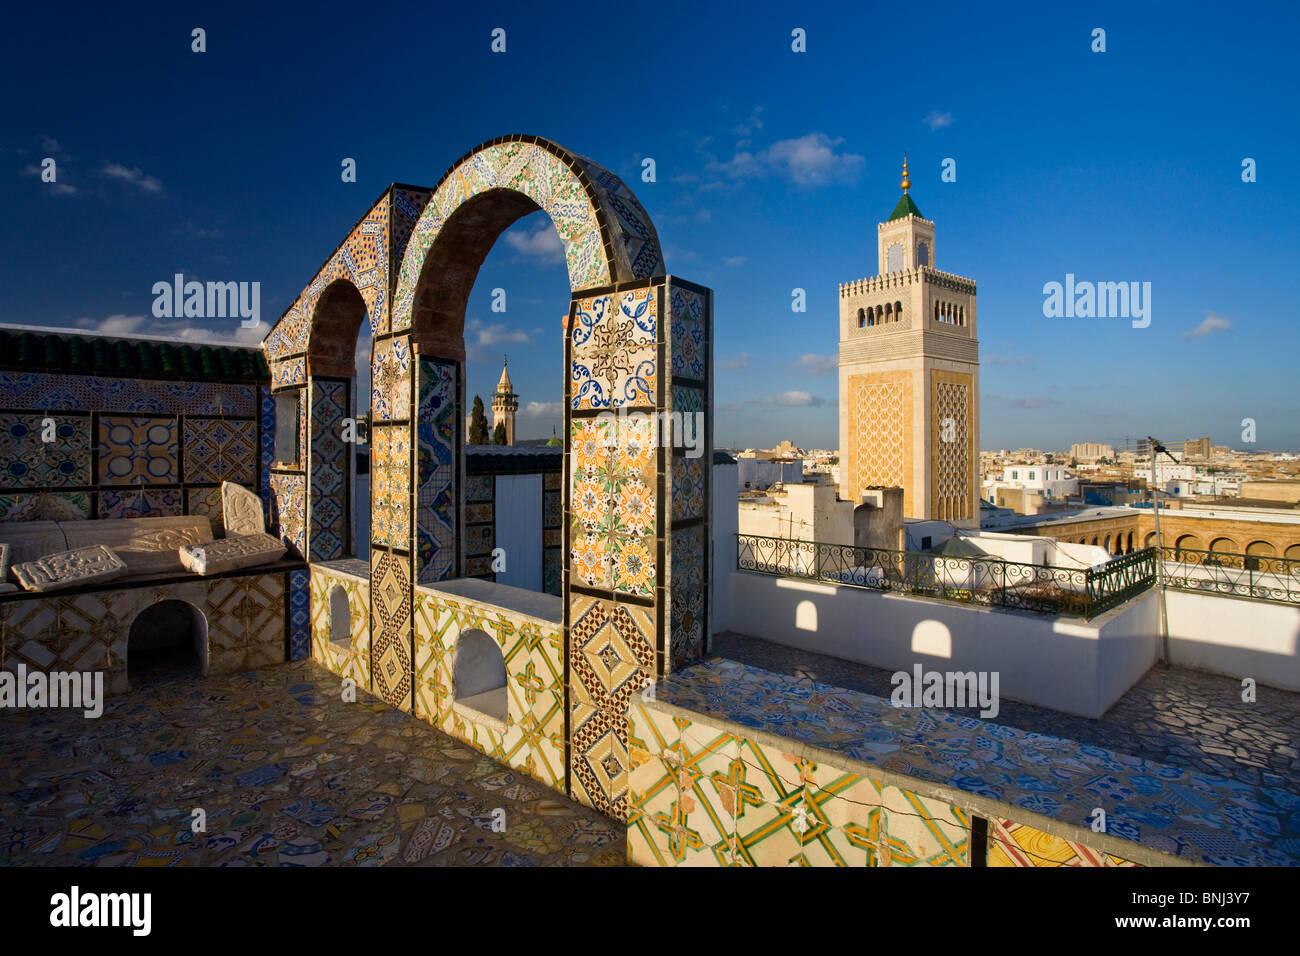 Tunisia Africa North Africa Arabian Arabic Arab Tunis town ...